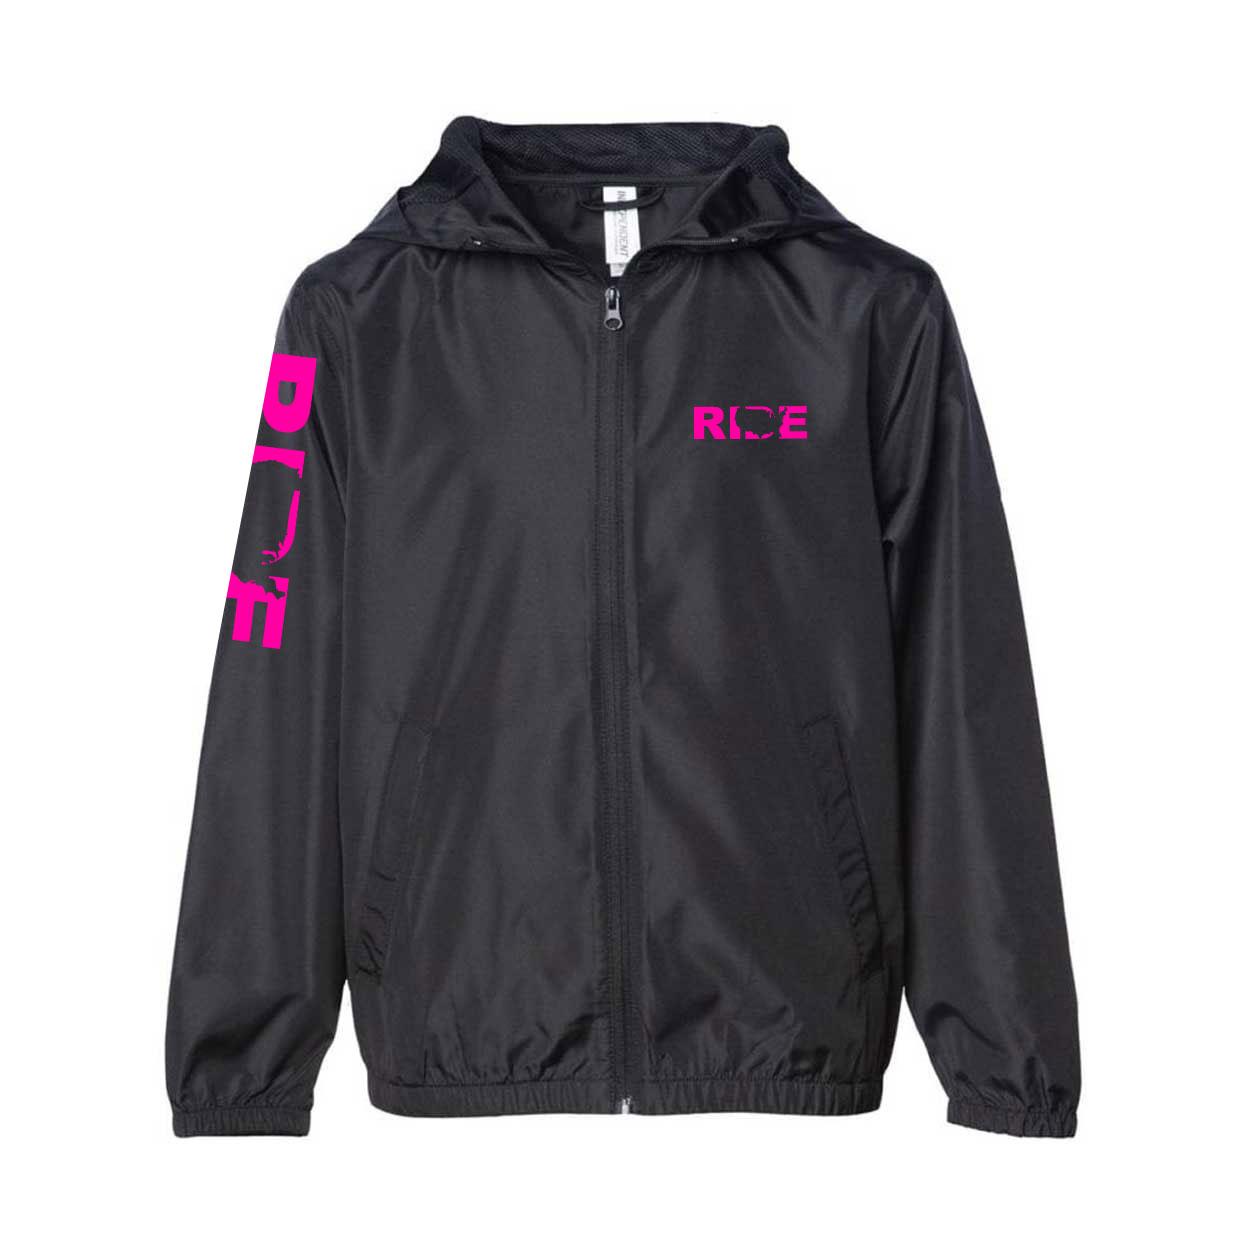 Ride United States Classic Youth Lightweight Windbreaker Black (Pink Logo)